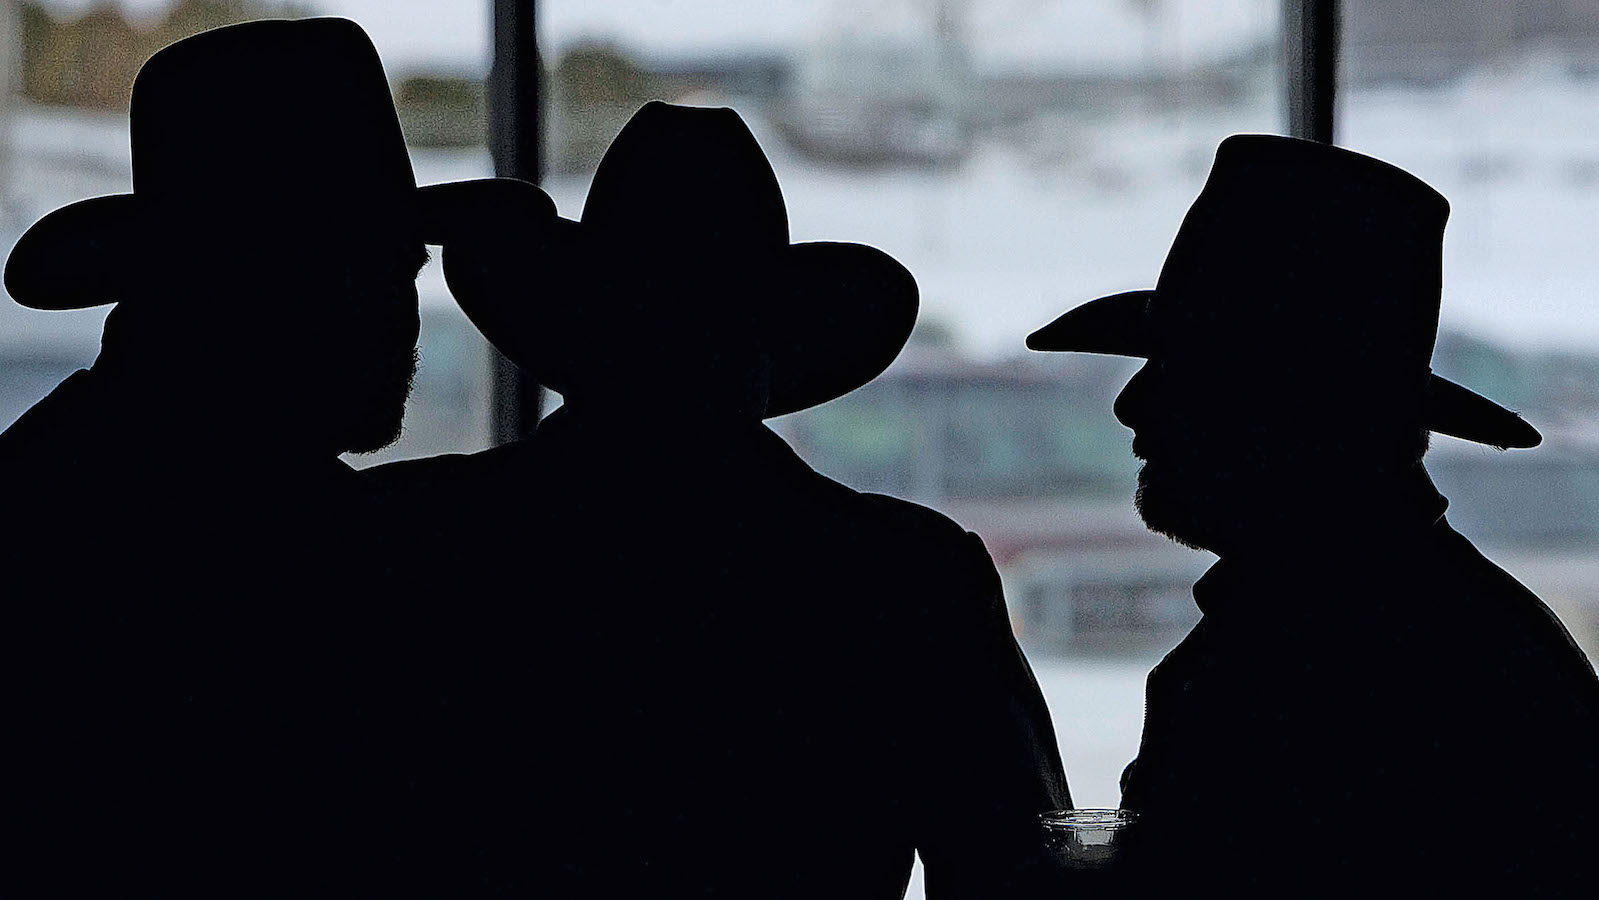 BC-NV--CowboyPoetry-101